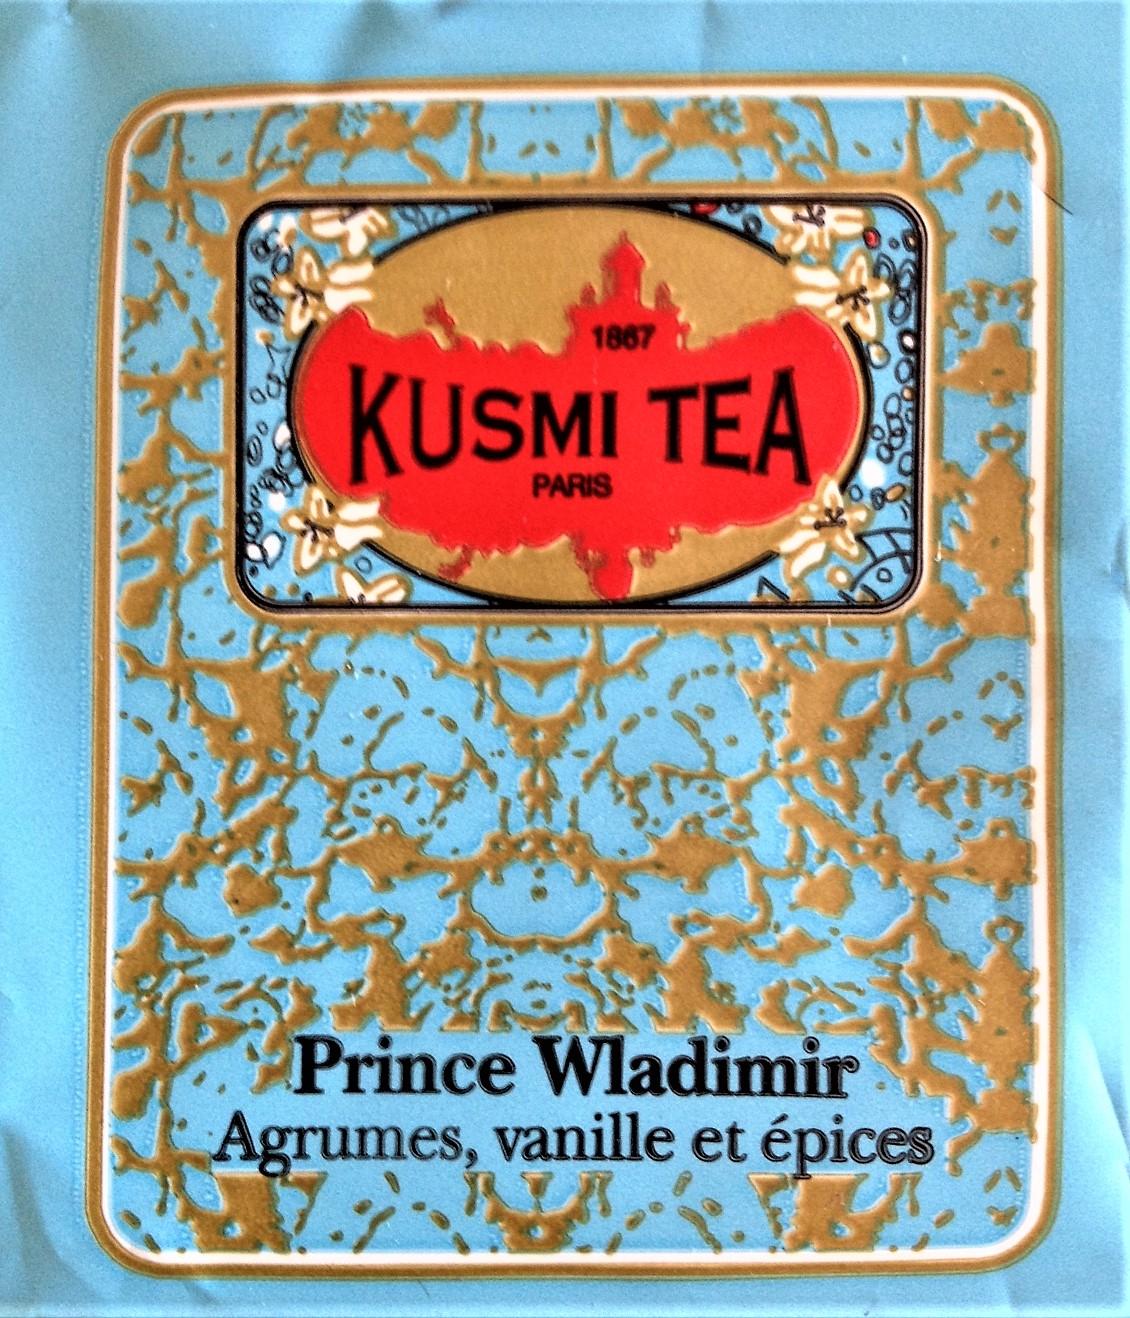 Kusmi Tea, Prince Wladimir